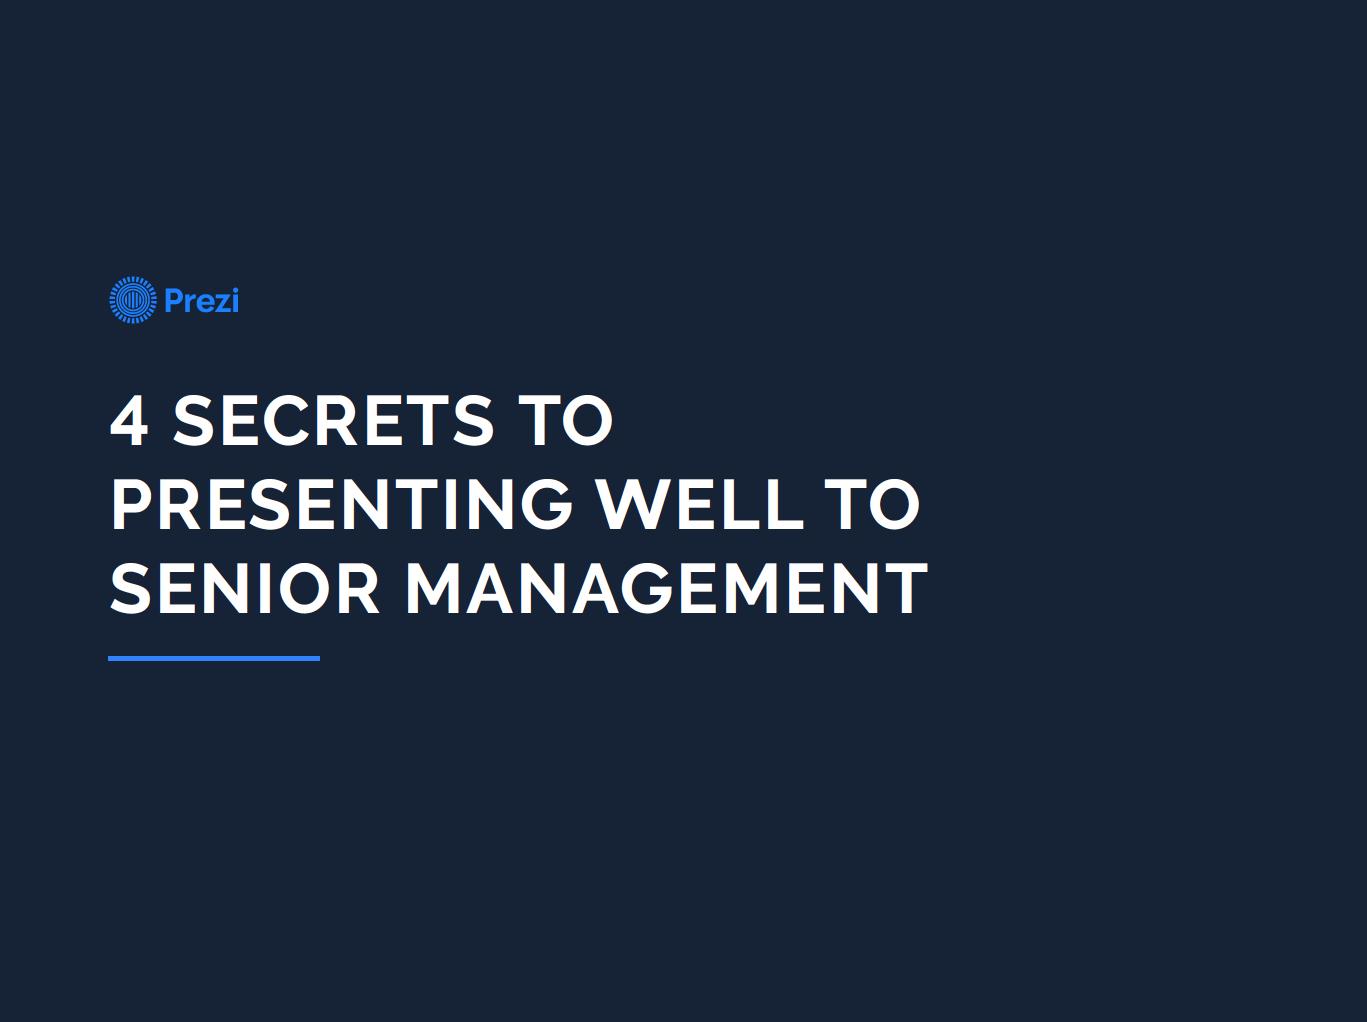 TBMfW - 4 Secrets on presenting to Senior Management